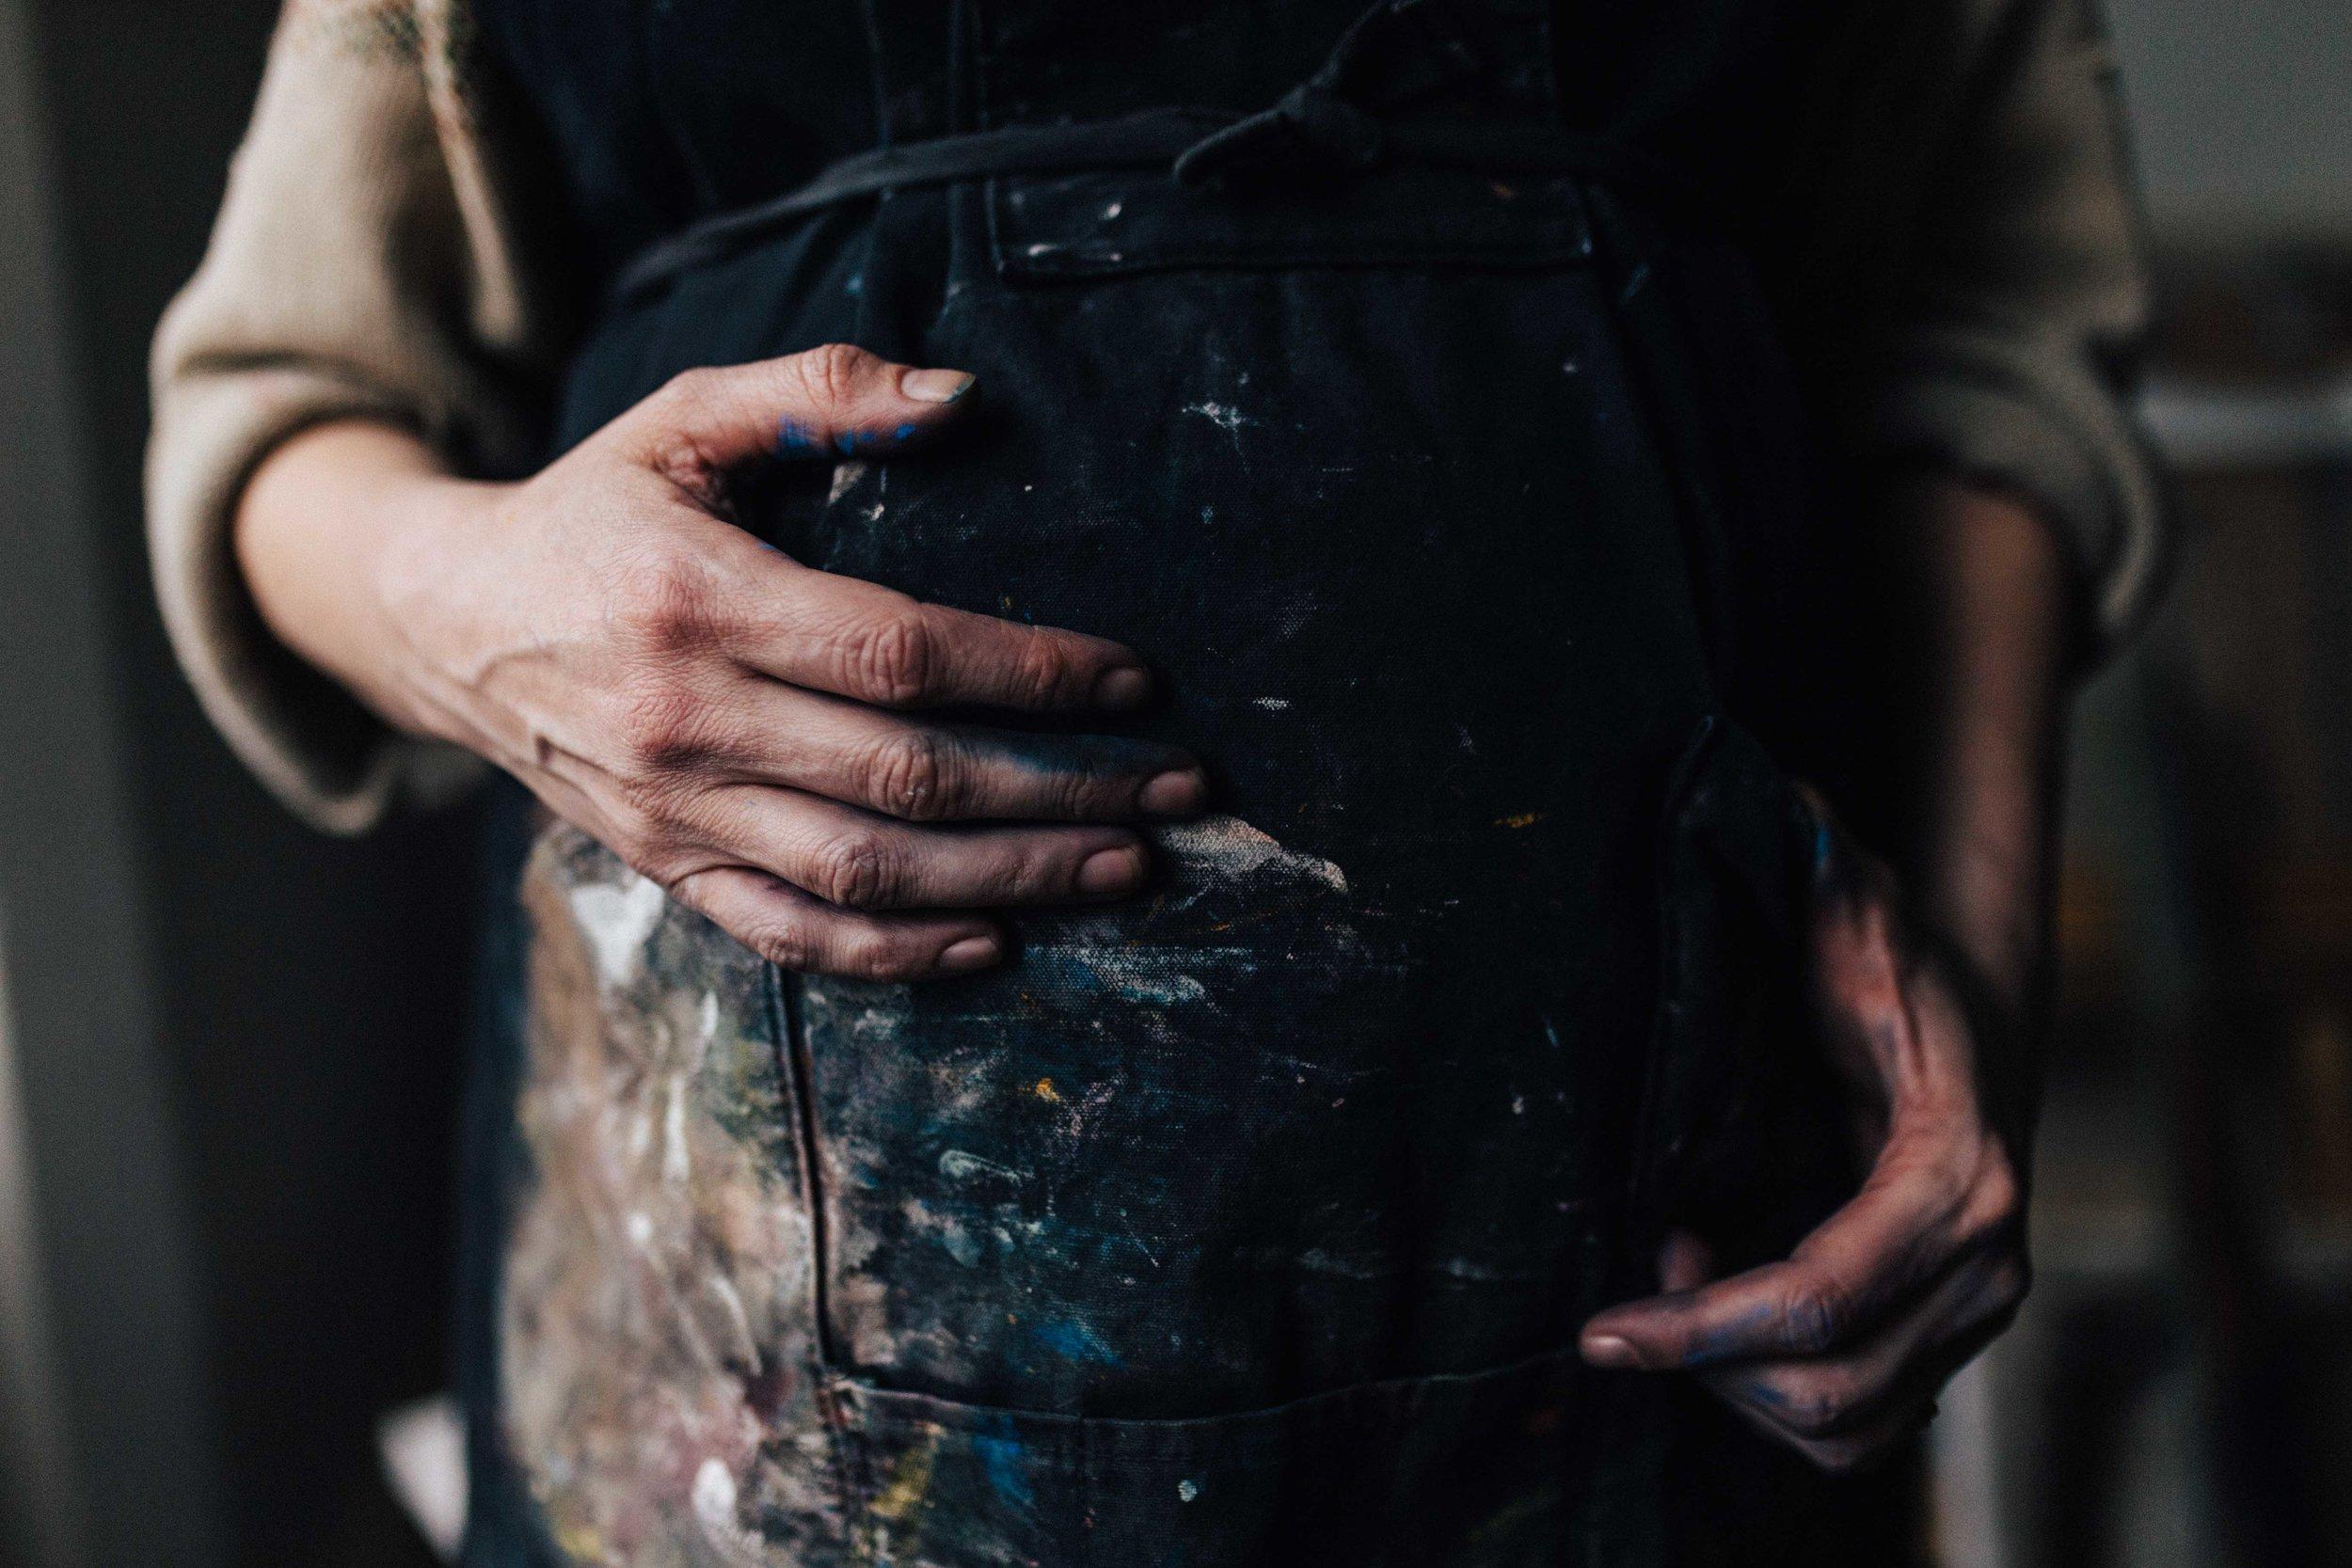 Details of visual artist Hester Finch - Branding photography